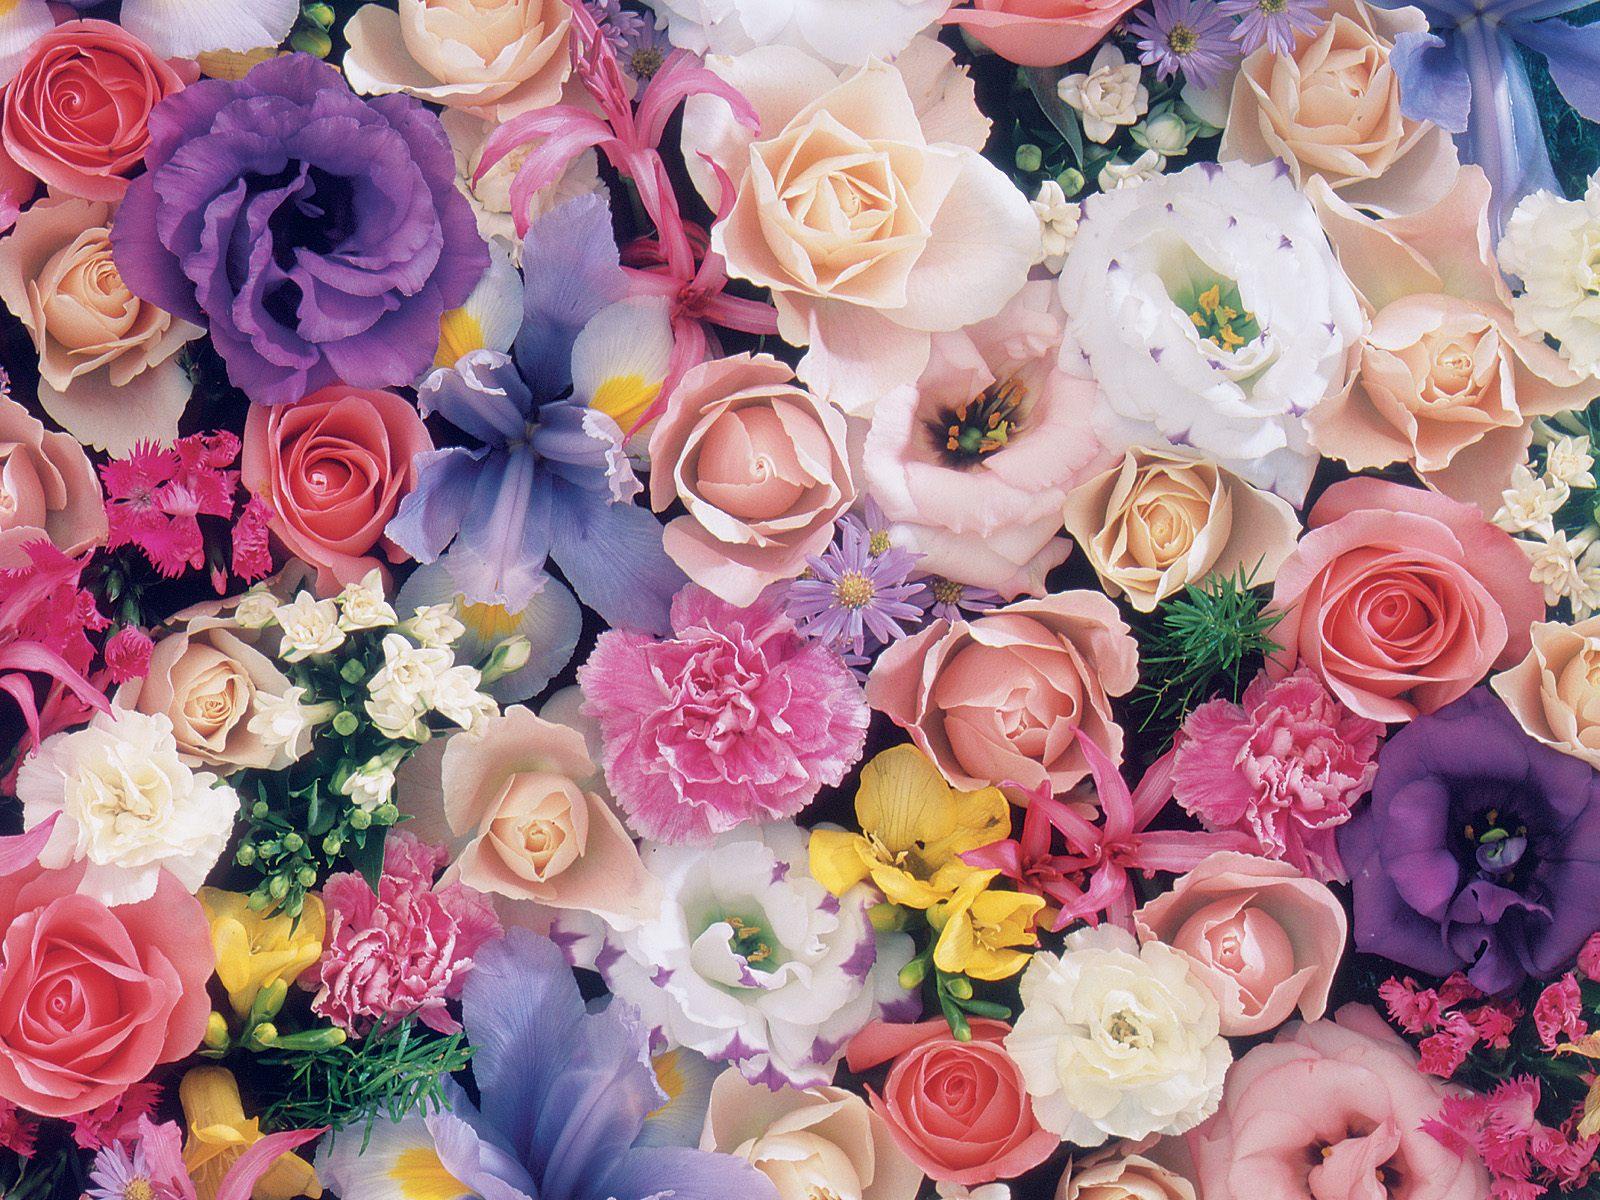 بالصور صور ورود جميلة , صور زهور جميله 3379 10